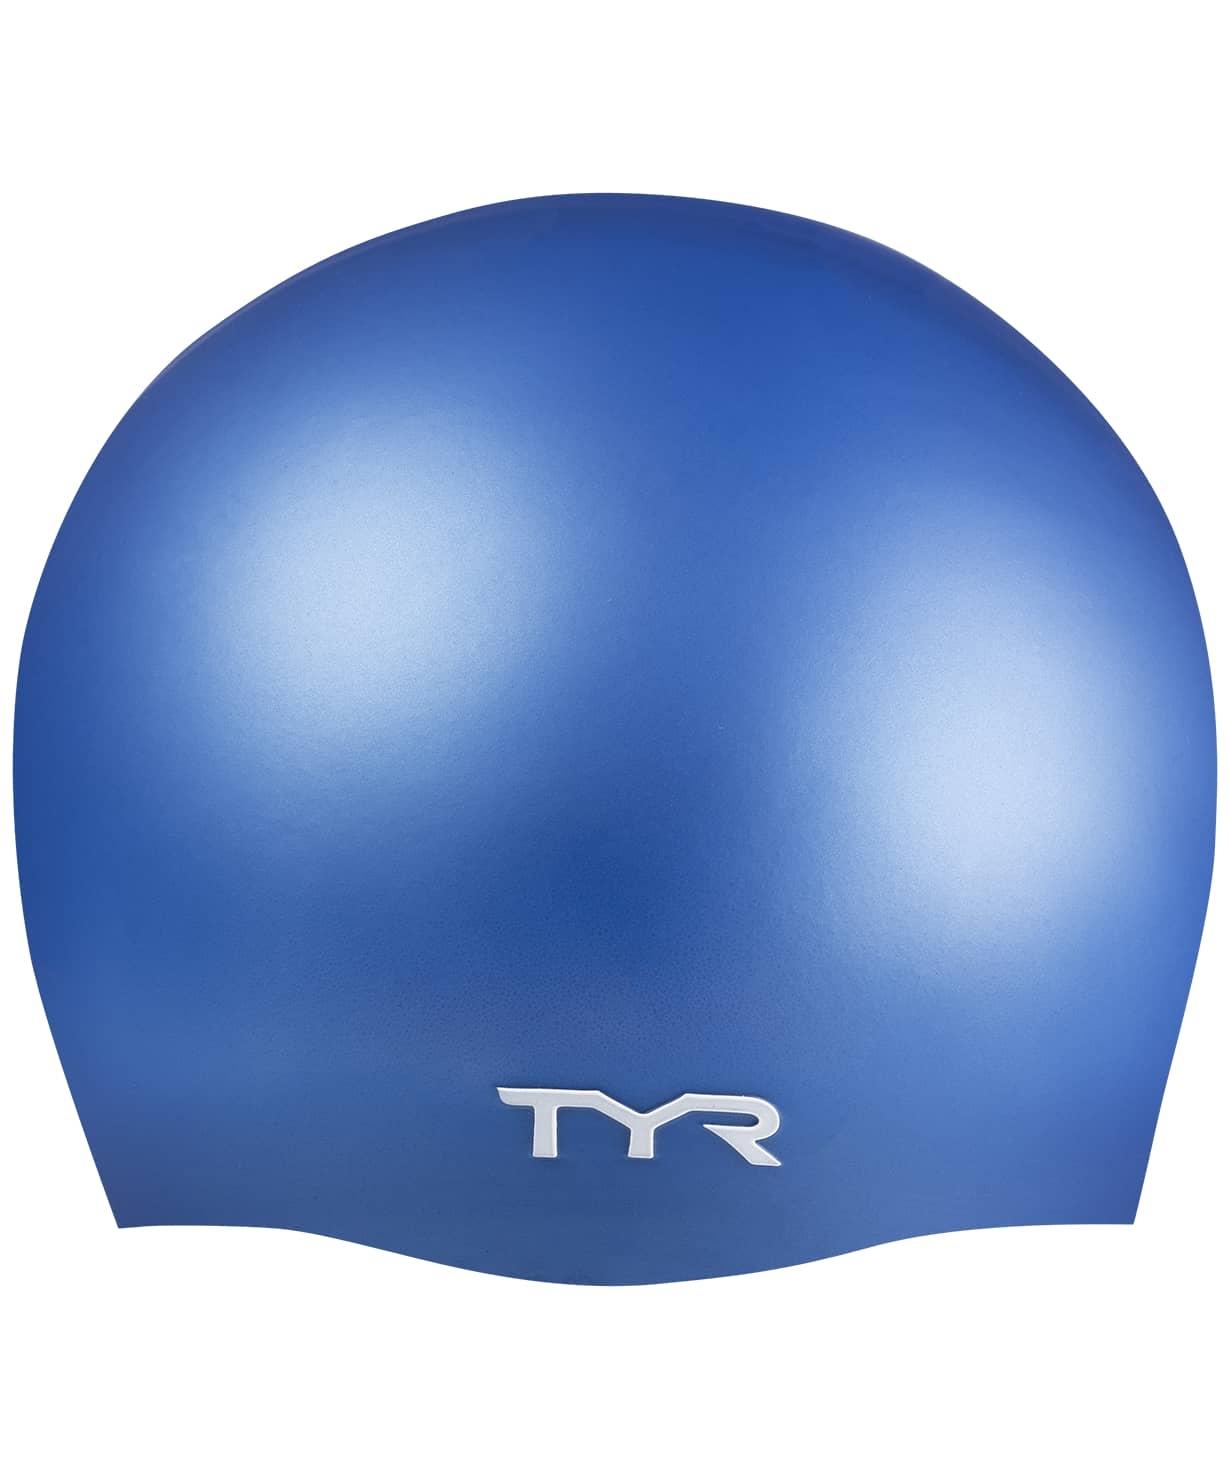 Шапочка для плавания Wrinkle Free Silicone Cap, силикон, LCS/420, голубой